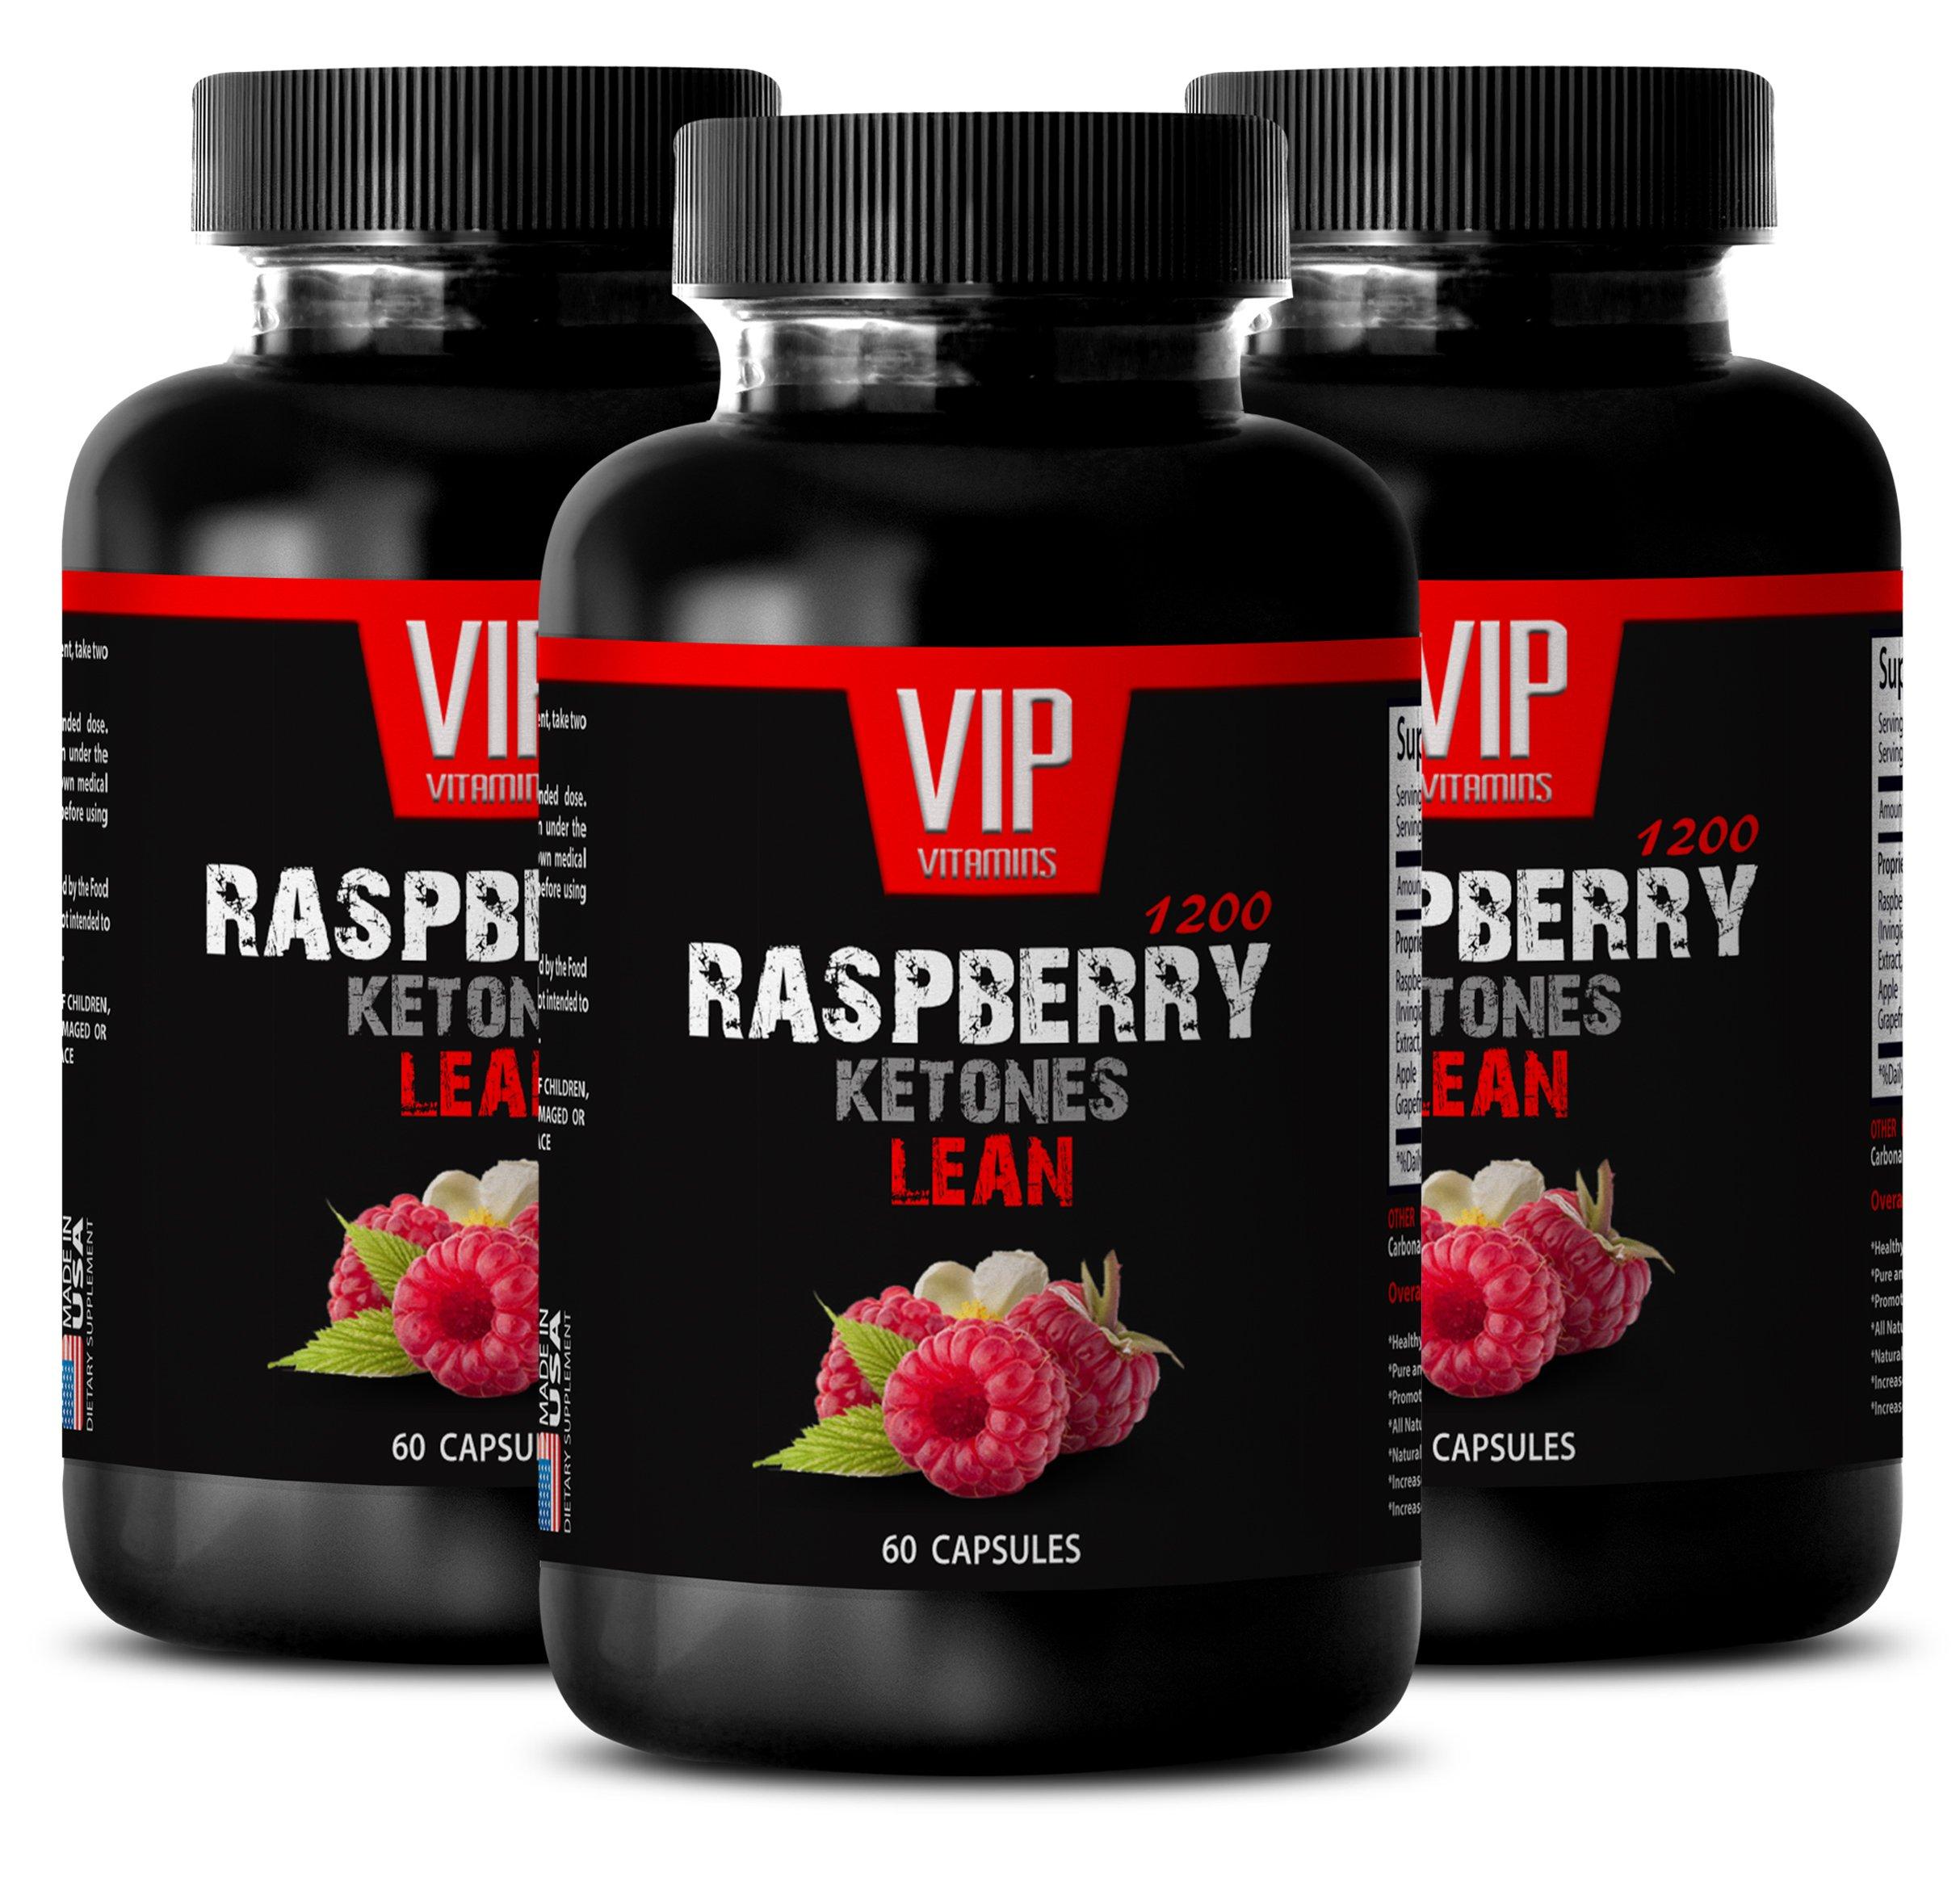 Weight Loss Quick Start - Raspberry Ketones Lean 1200MG - Raspberry Ketone Weight Loss - 3 Bottles (180 Capsules)